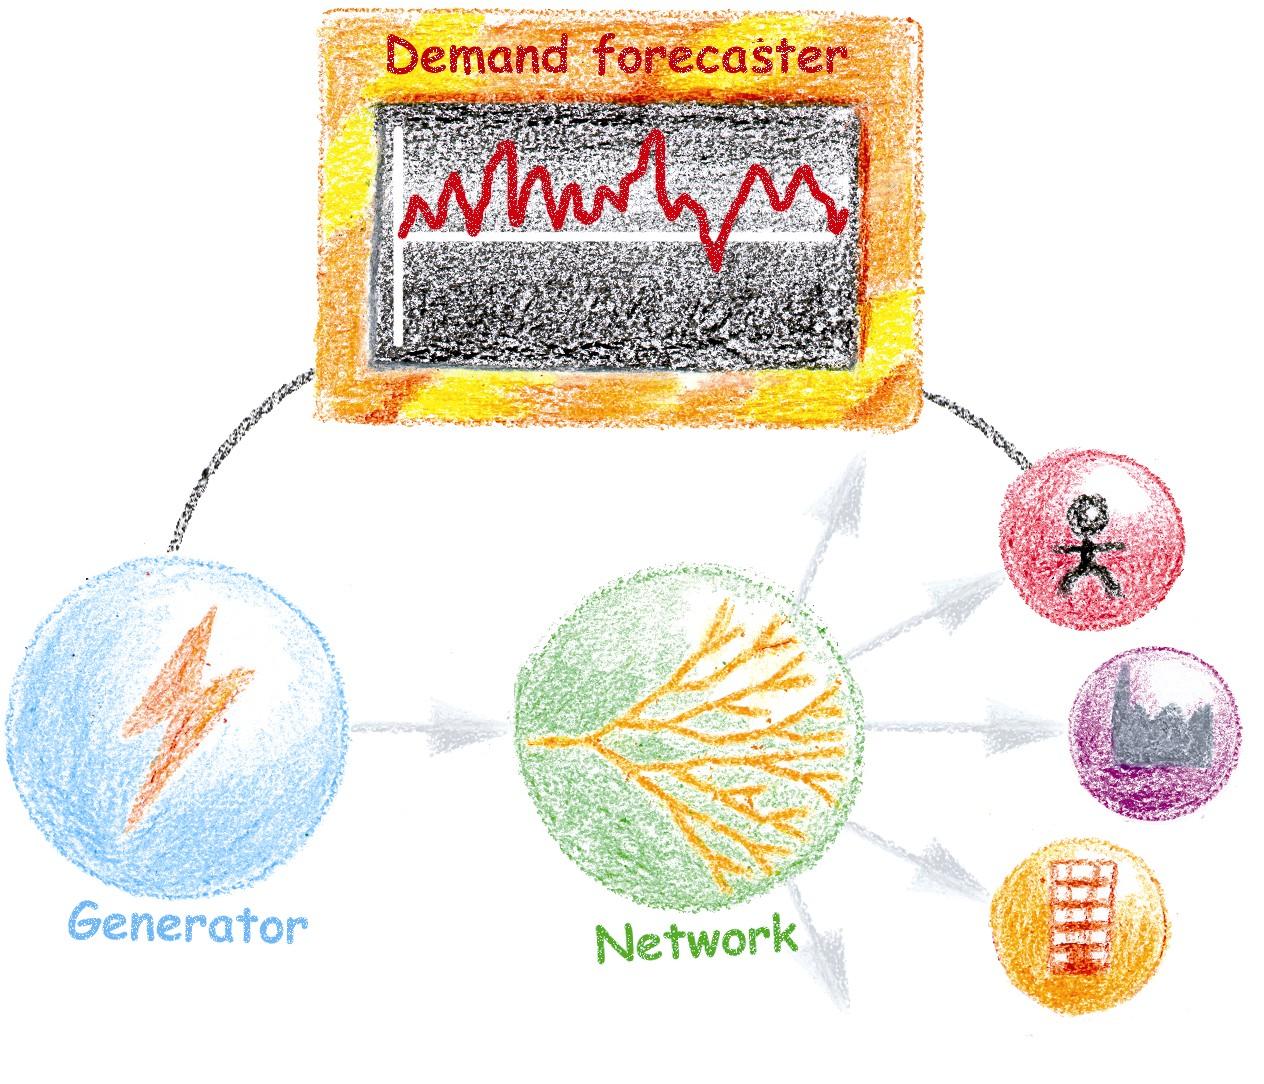 Demand Forecasting Examples For Demand Forecasting to